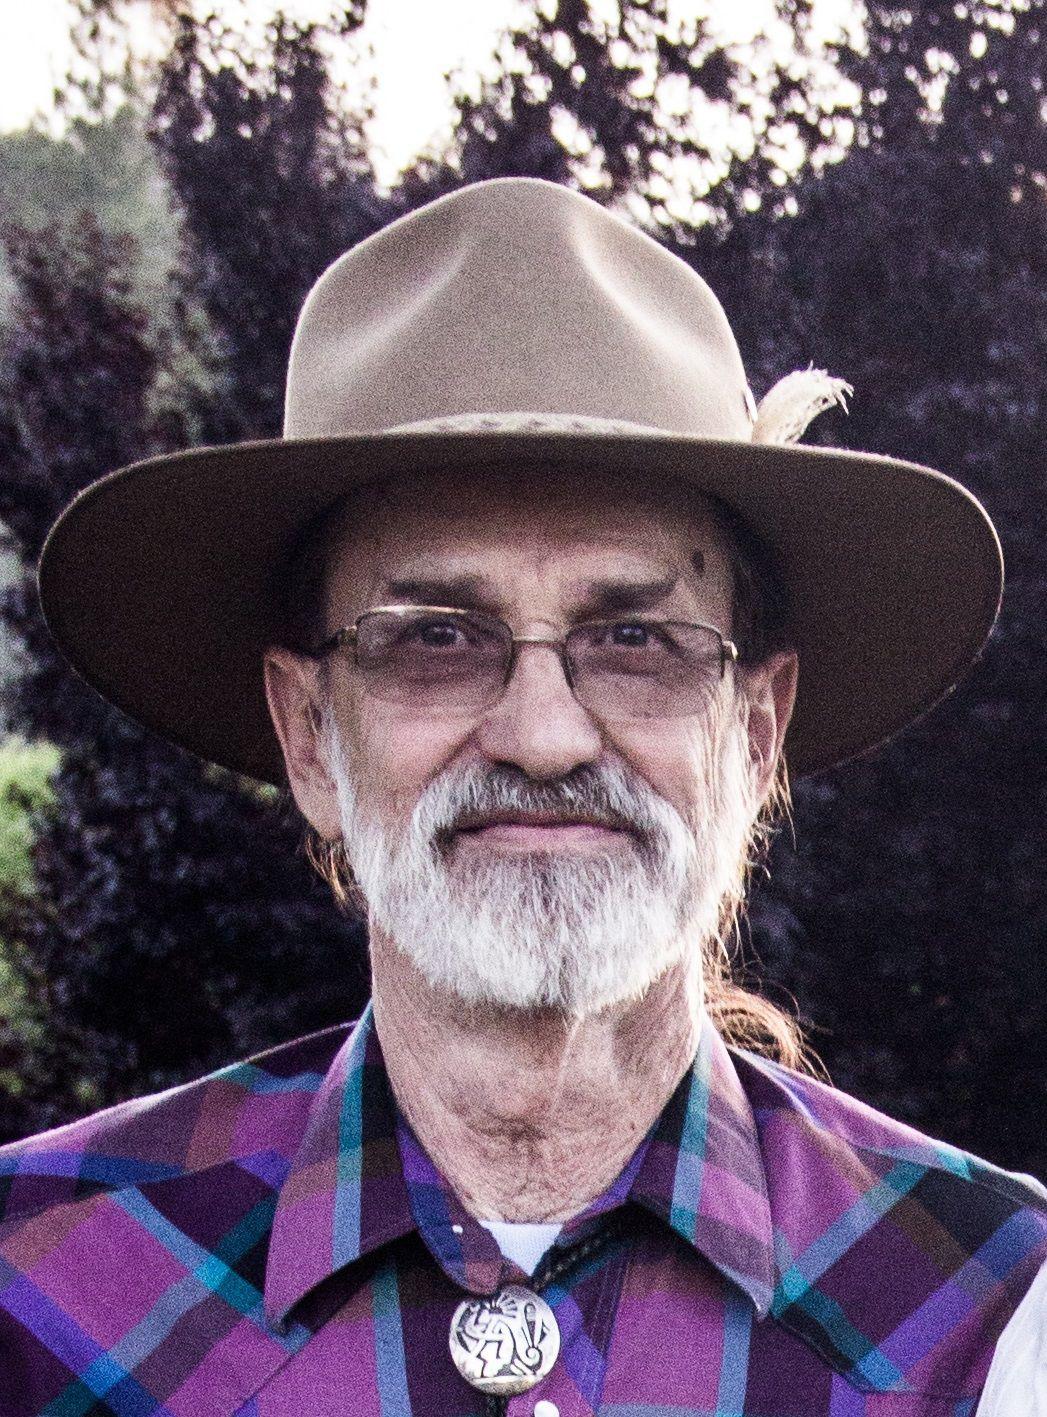 Douglas Troutman